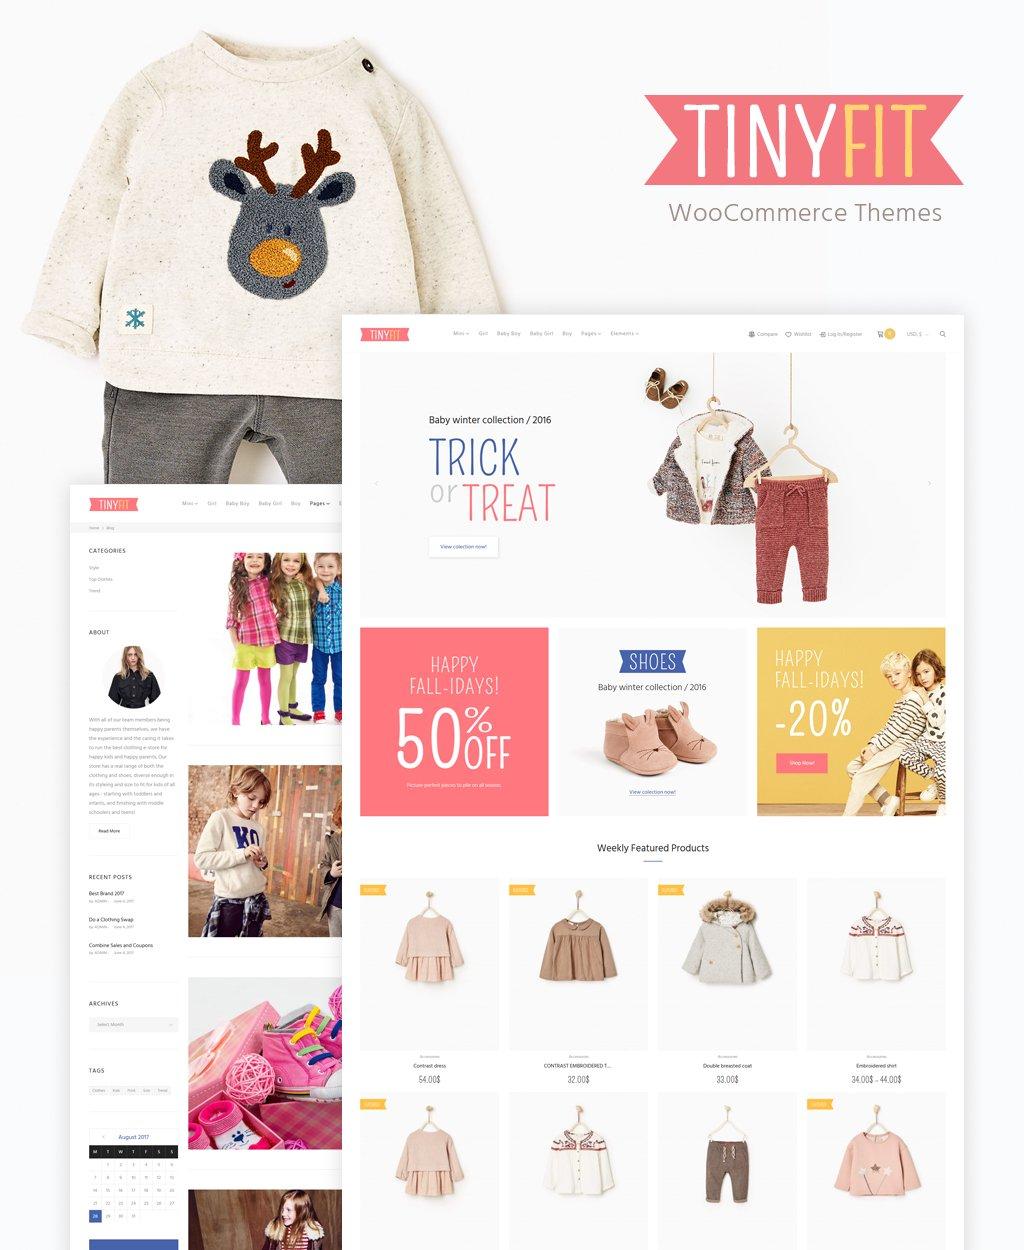 TinyFit WooCommerce Theme WooCommerce Theme - screenshot